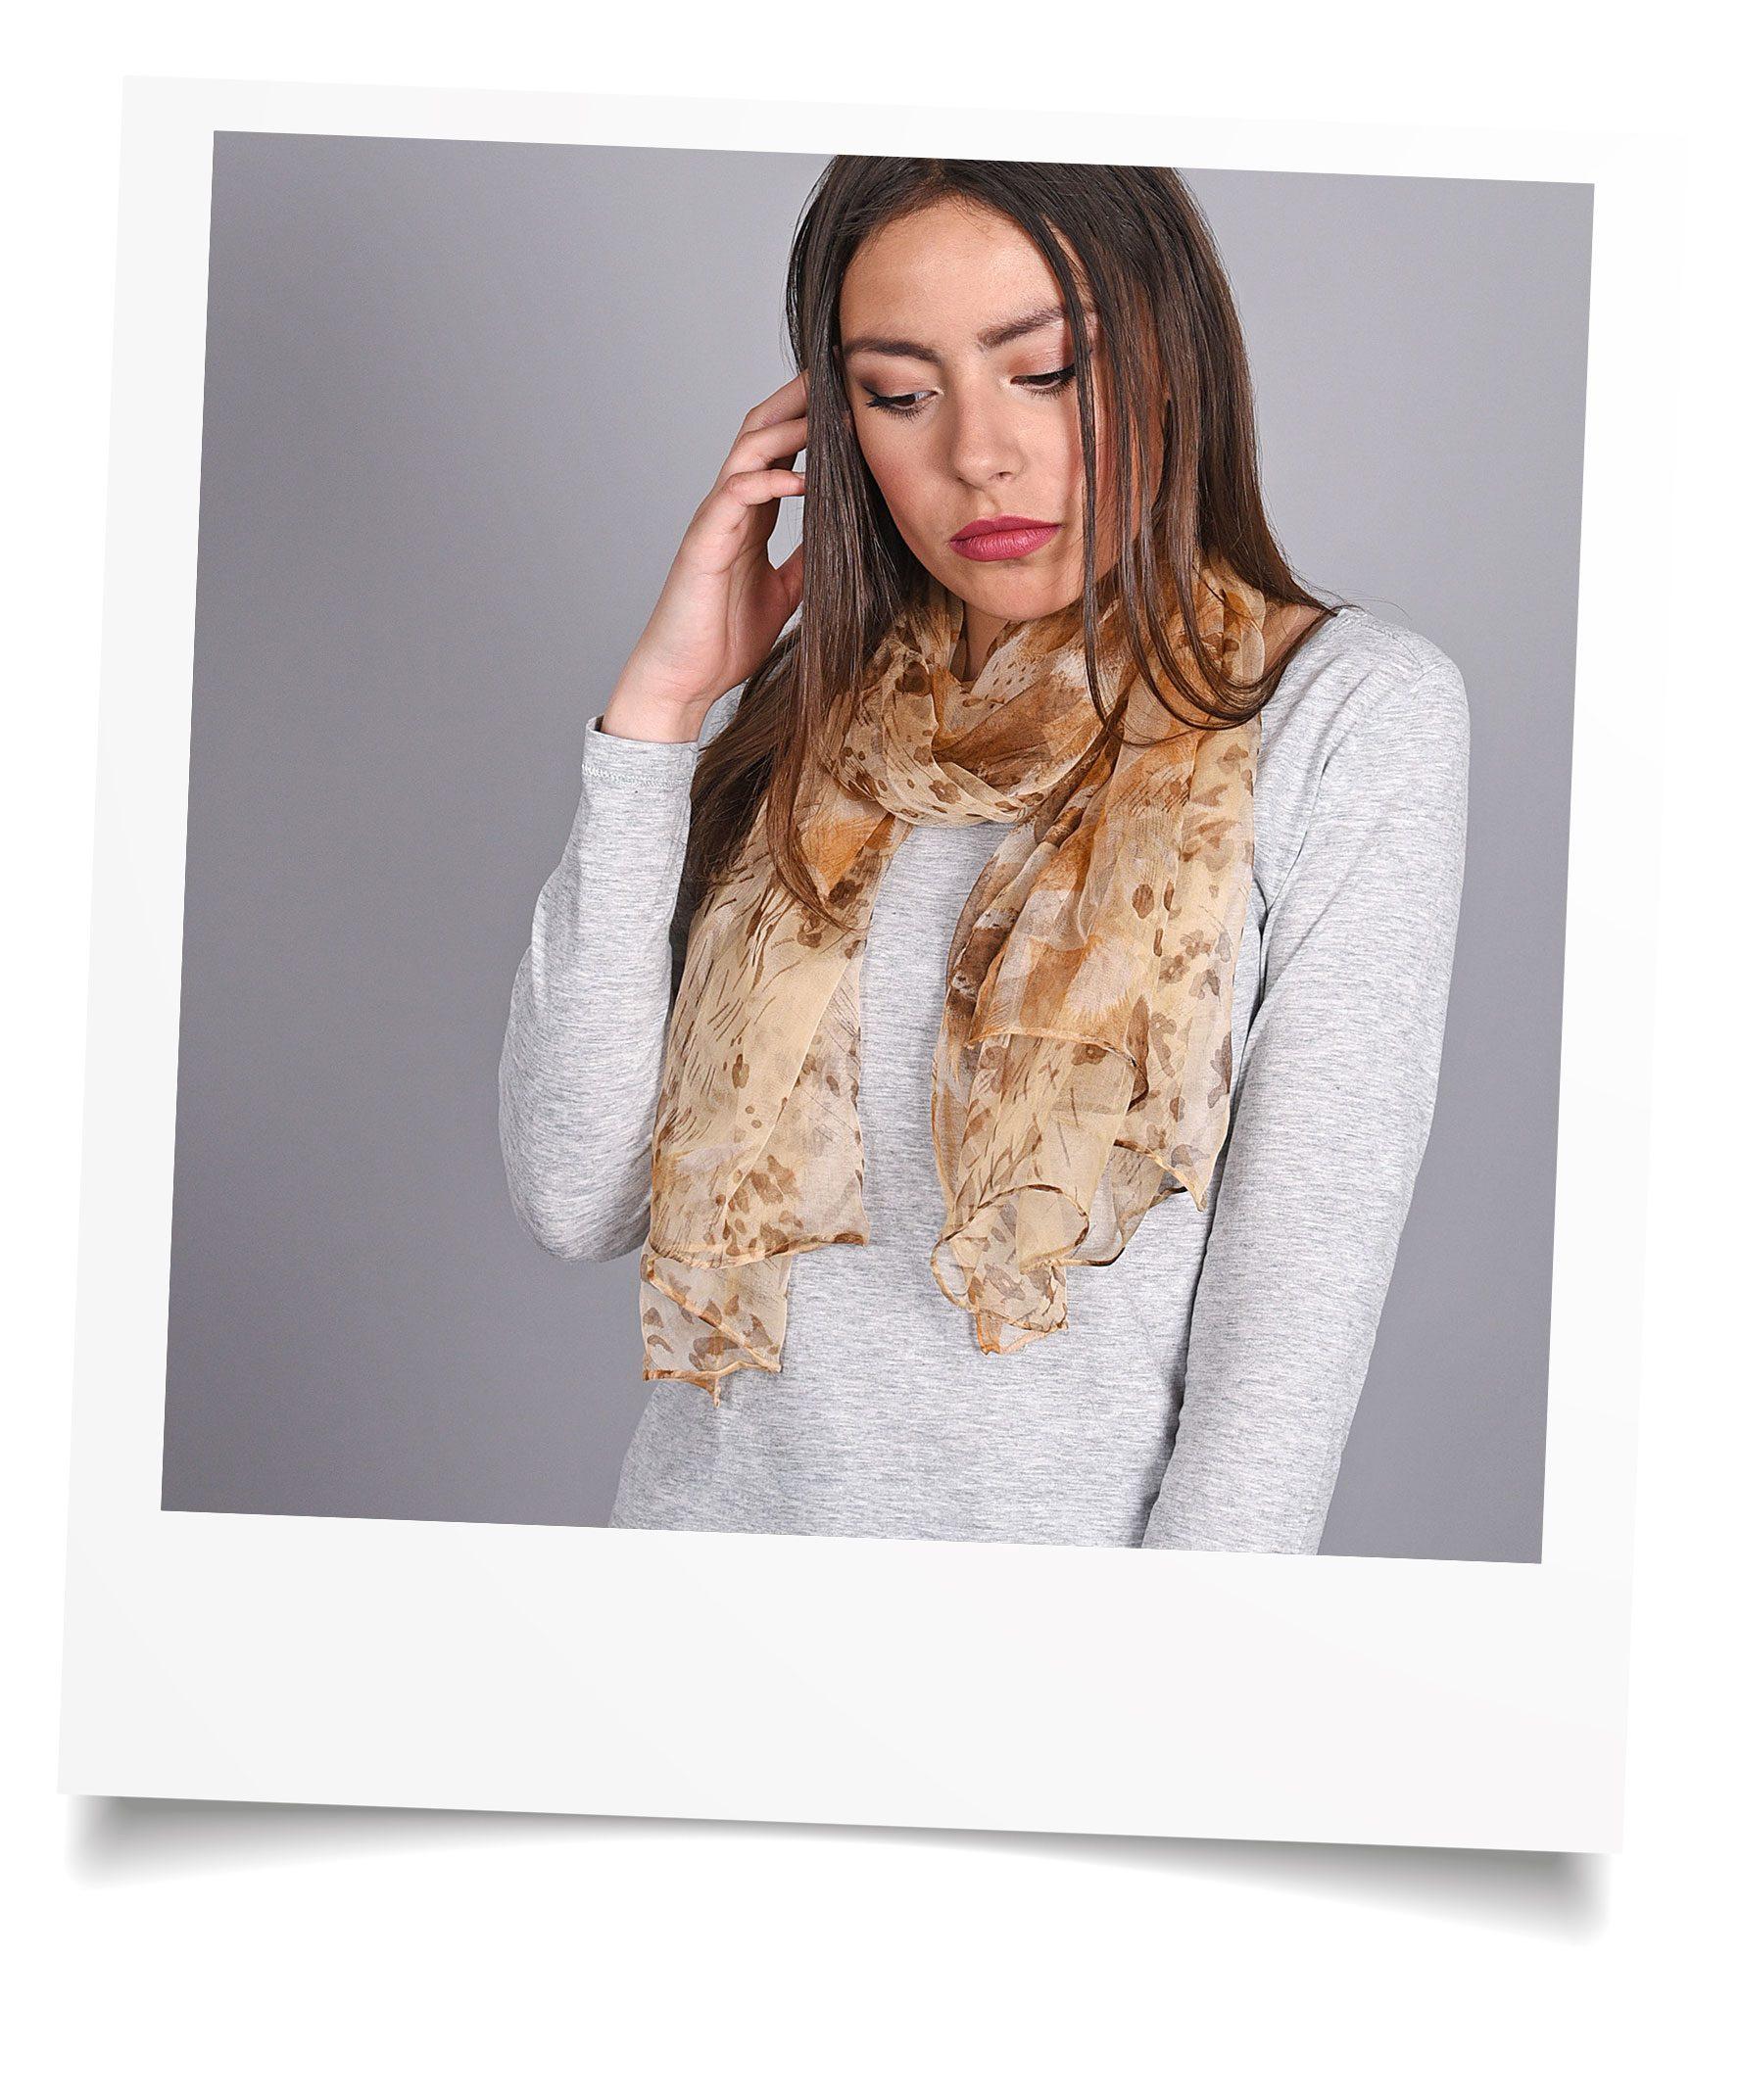 http://lookbook.allee-du-foulard.fr/wp-content/uploads/2018/09/0695-5-ADF-Accessoires-de-mode-LB-Selection_leopard-foulard-mousseline-marron-1776x2144.jpg